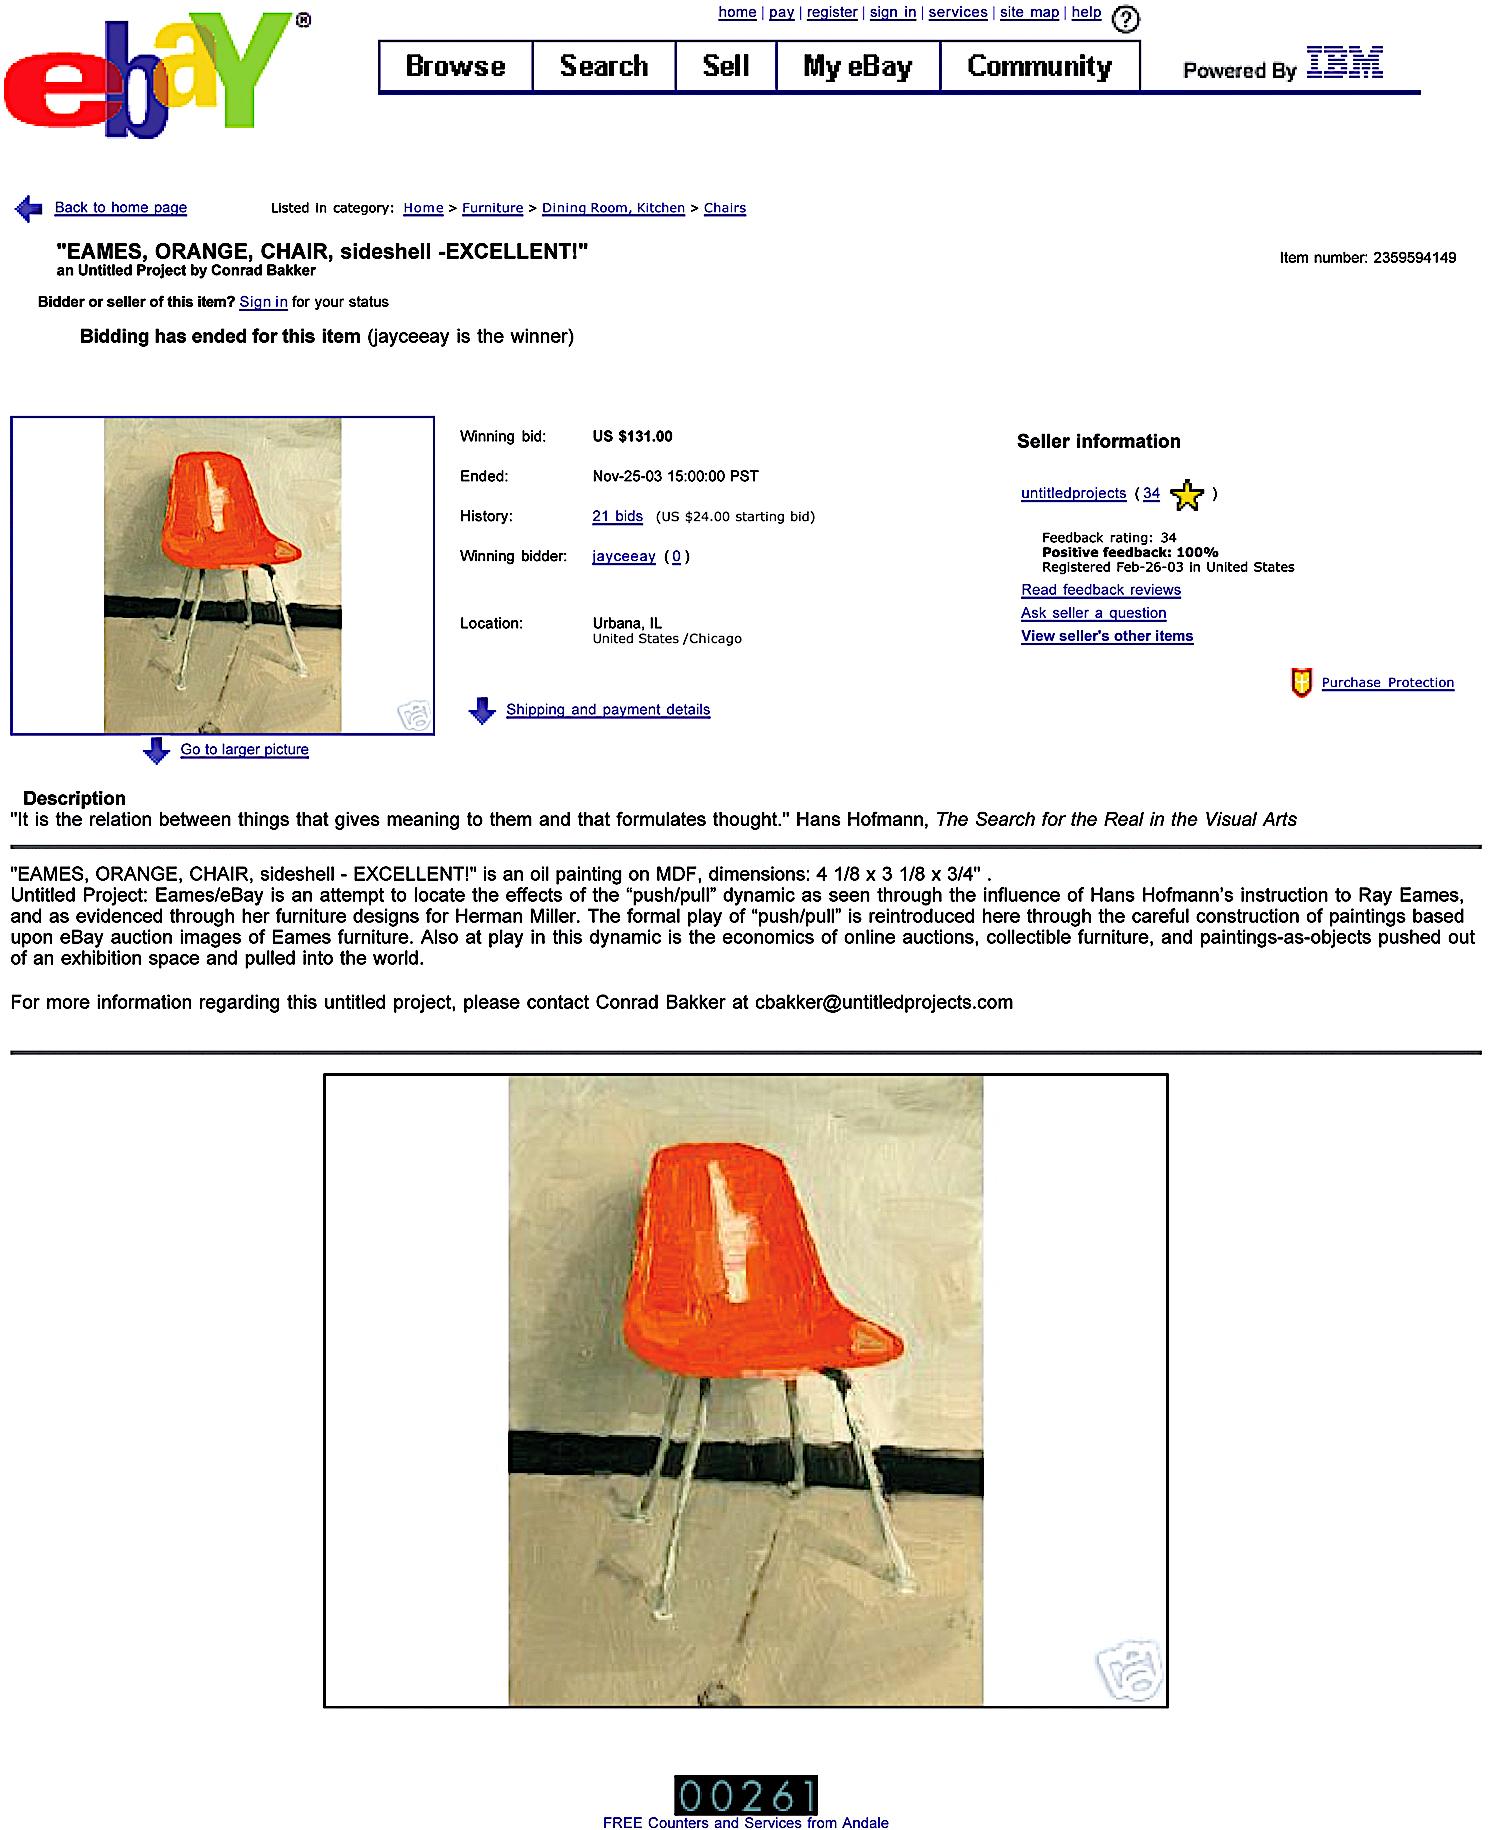 1 Untitled Project, Eames eBay, oil paint on wood panel, 2003 3.jpeg